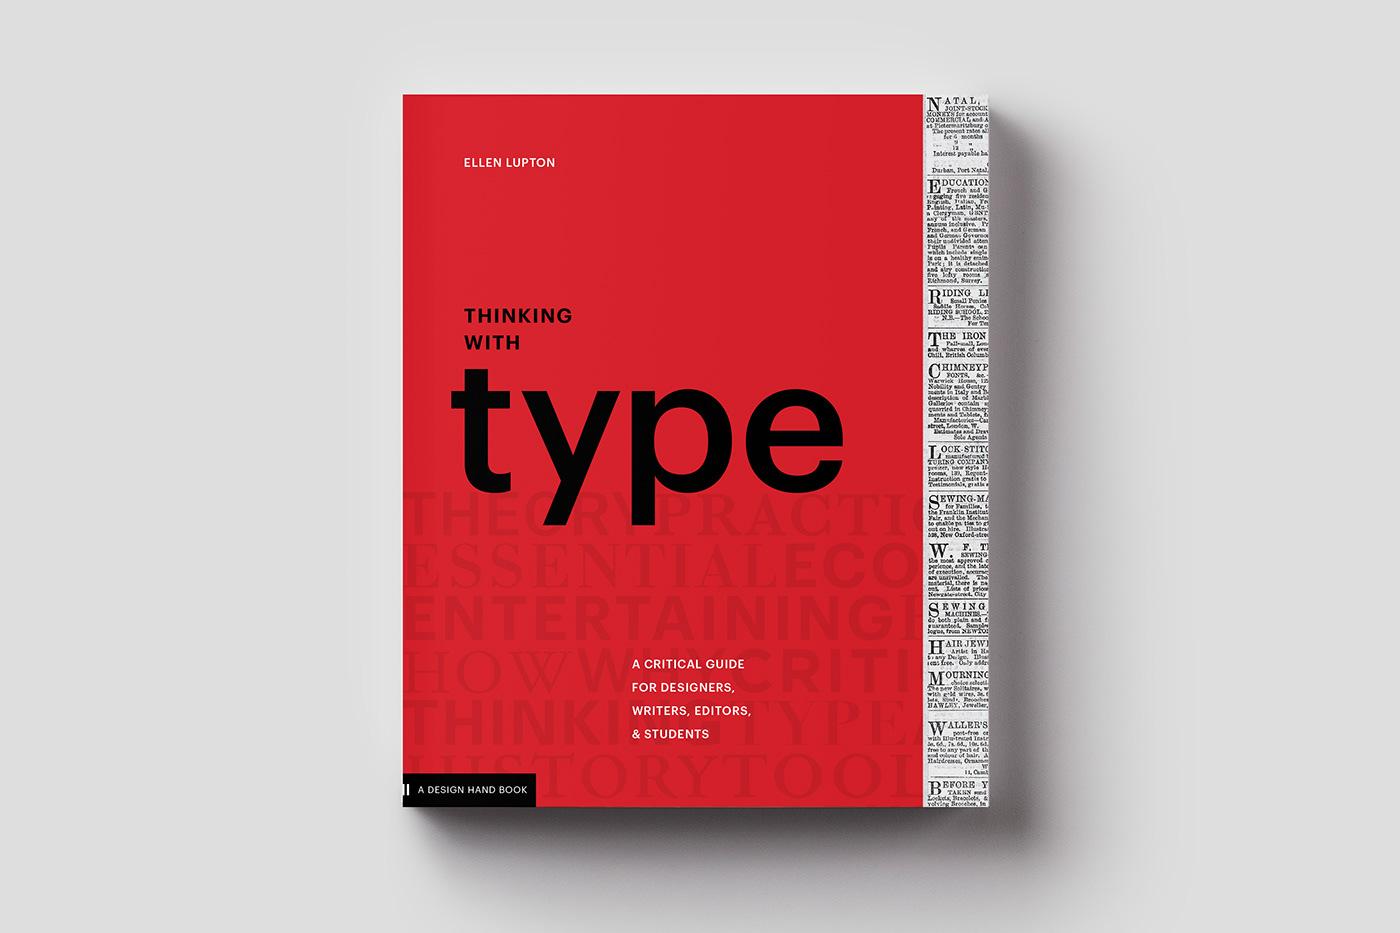 publication design book design Layout editorial design  typography   book book cover Magazine design editorial art Layout Design